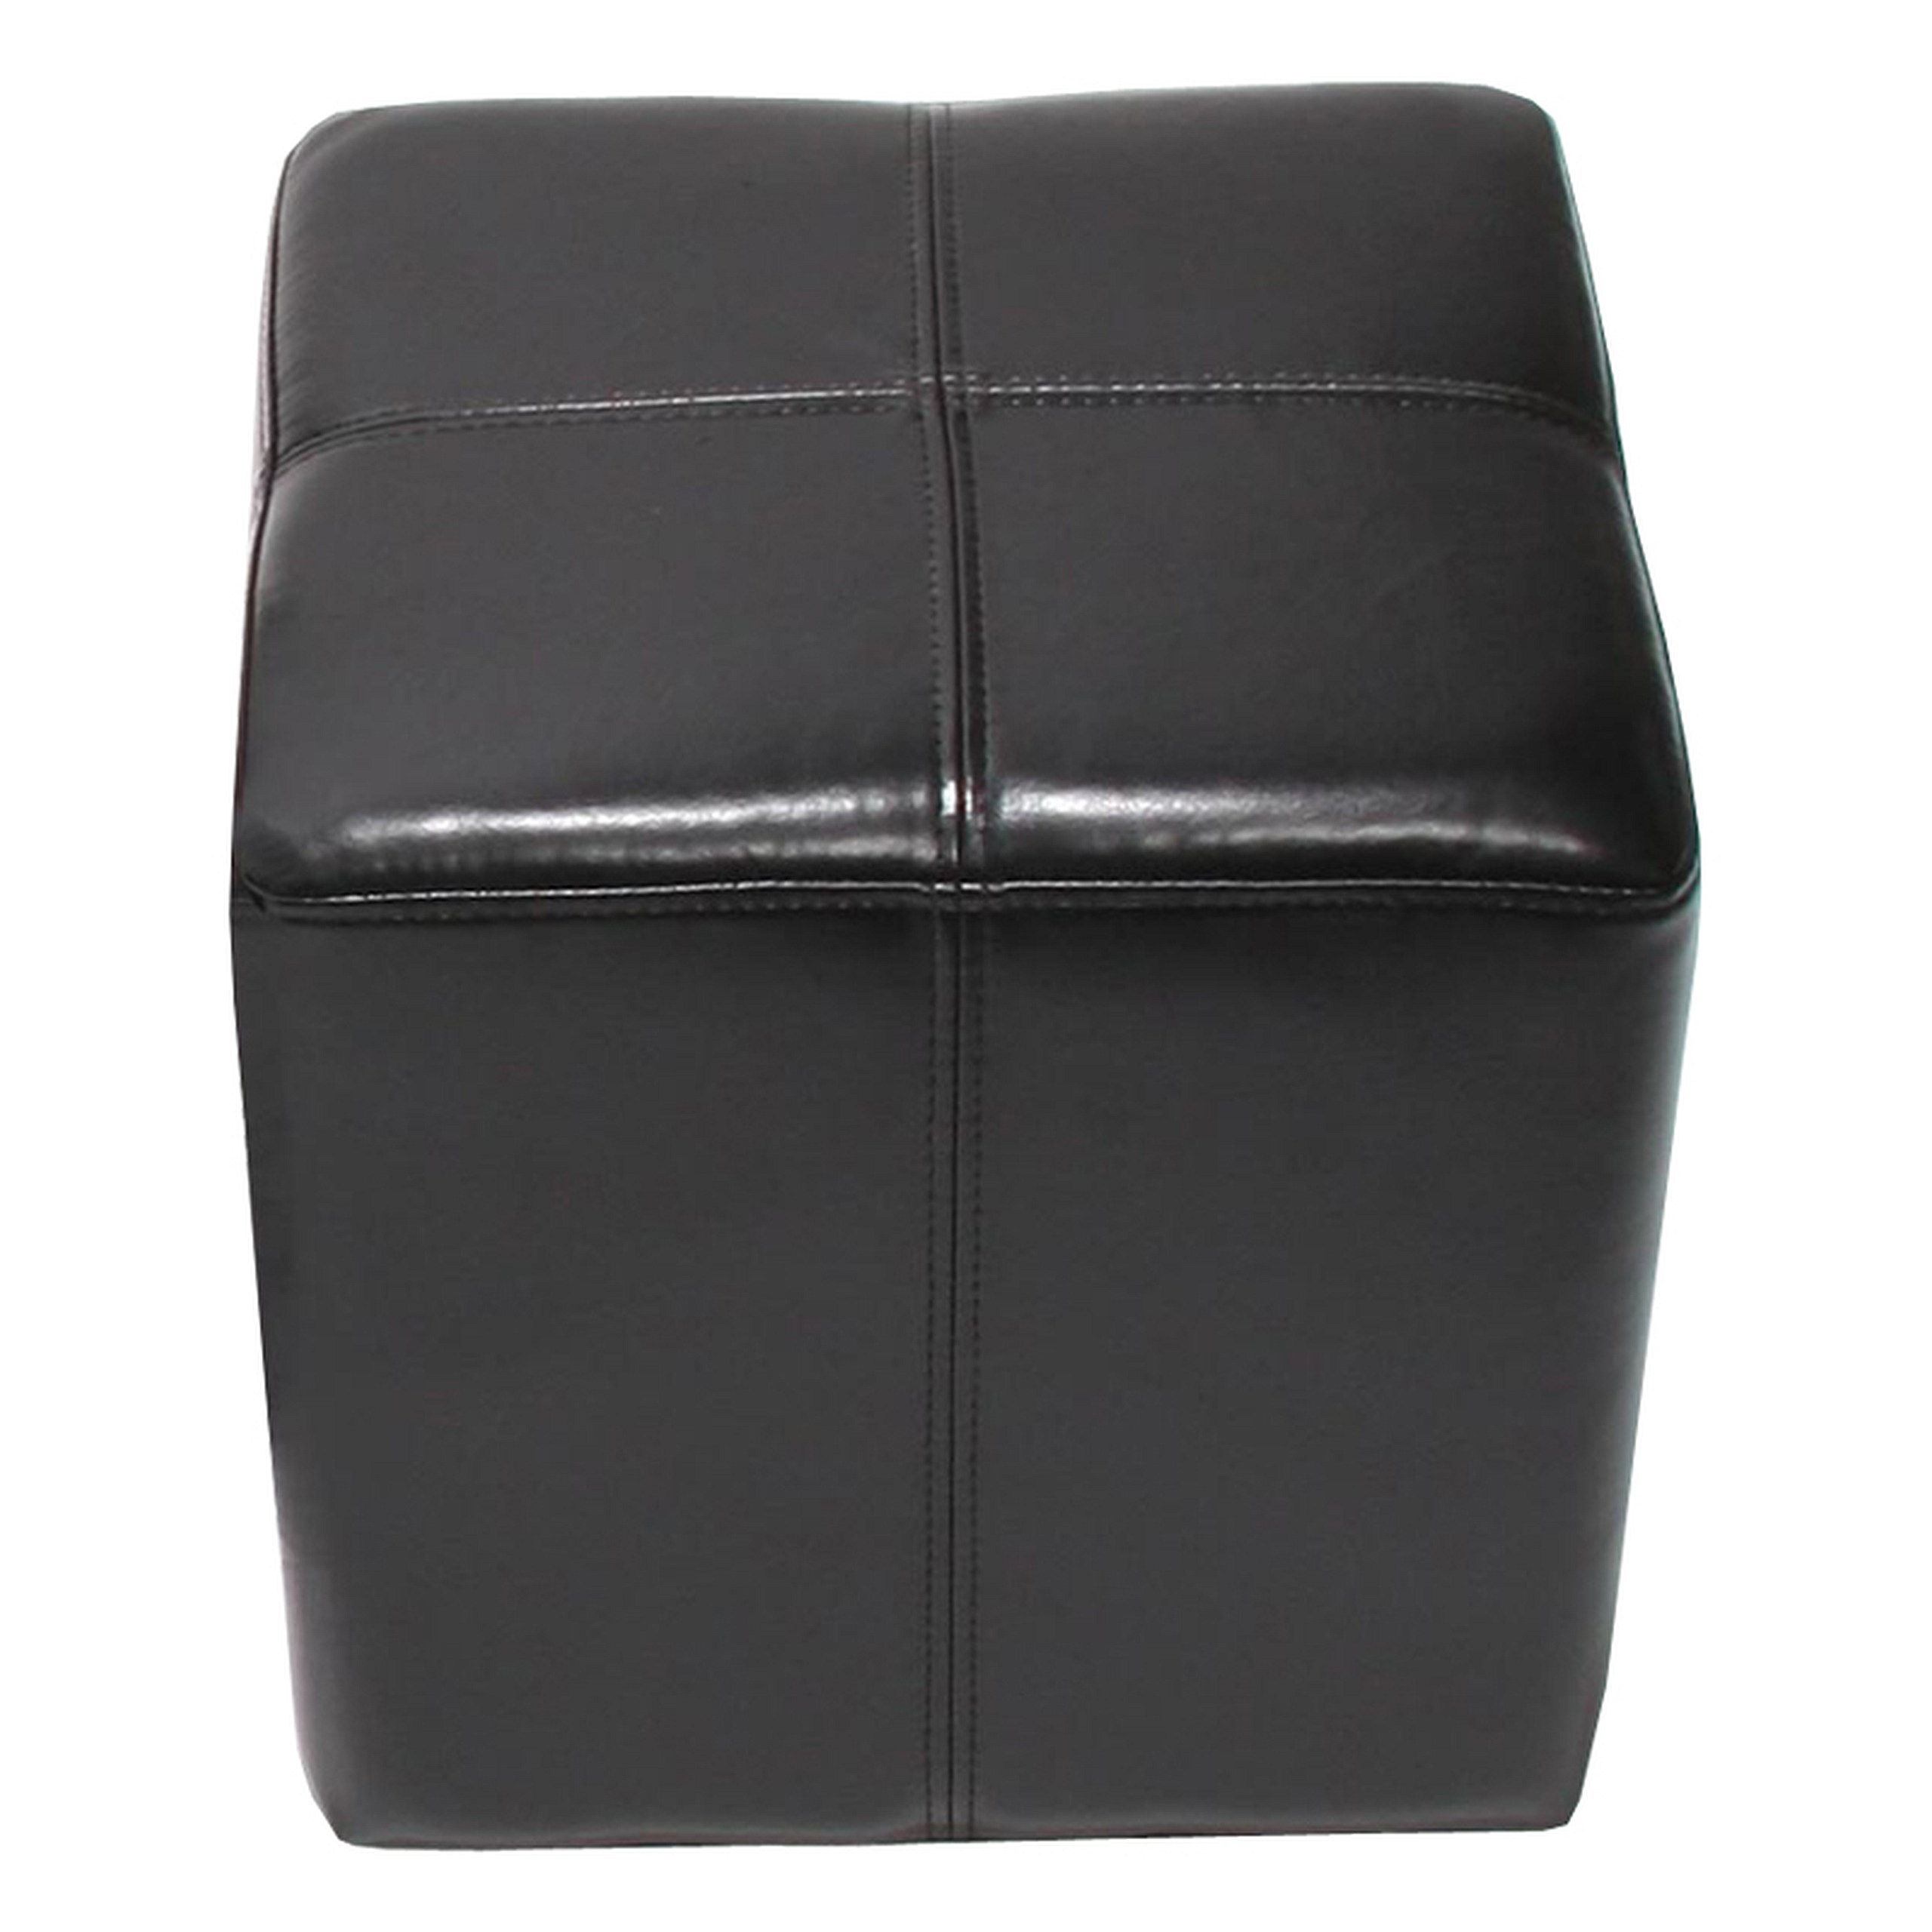 sitzw rfel hocker sitzhocker onex leder 36x36x36cm schwarz. Black Bedroom Furniture Sets. Home Design Ideas